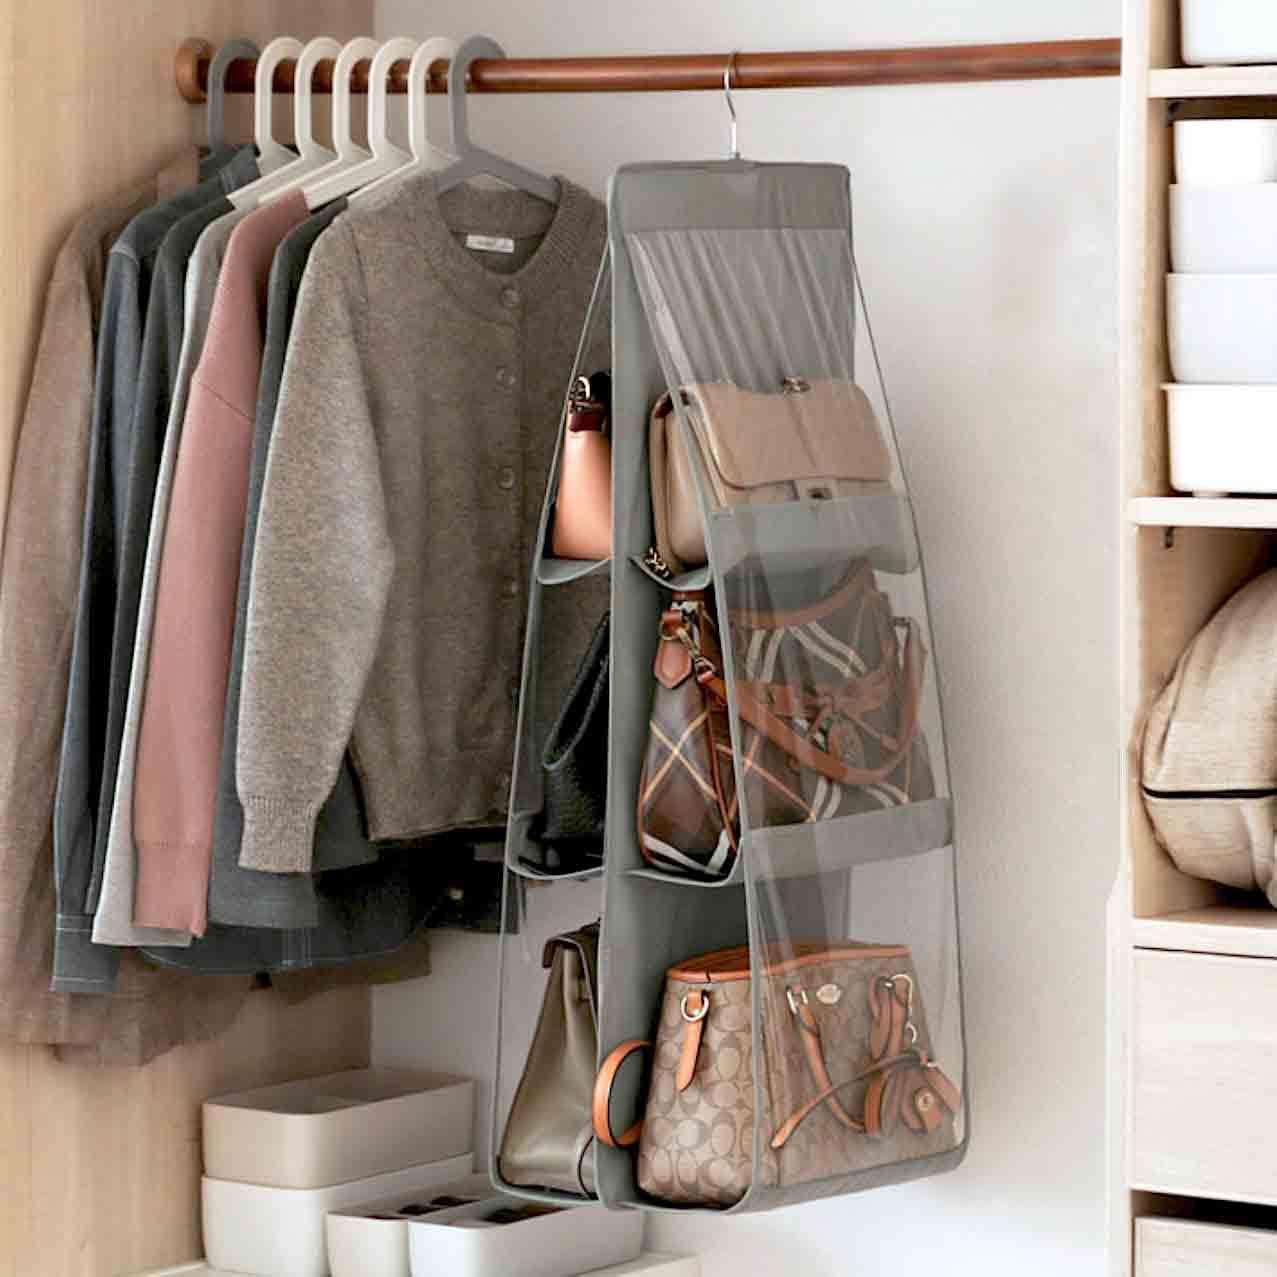 Walk-in Wardrobe Closet Organization Ideas For HDB & Condo Singapore Homes Purse & Handbag Closet Organizer Organizers Slim Bags Organiser Holder Style Degree Sg Singapore